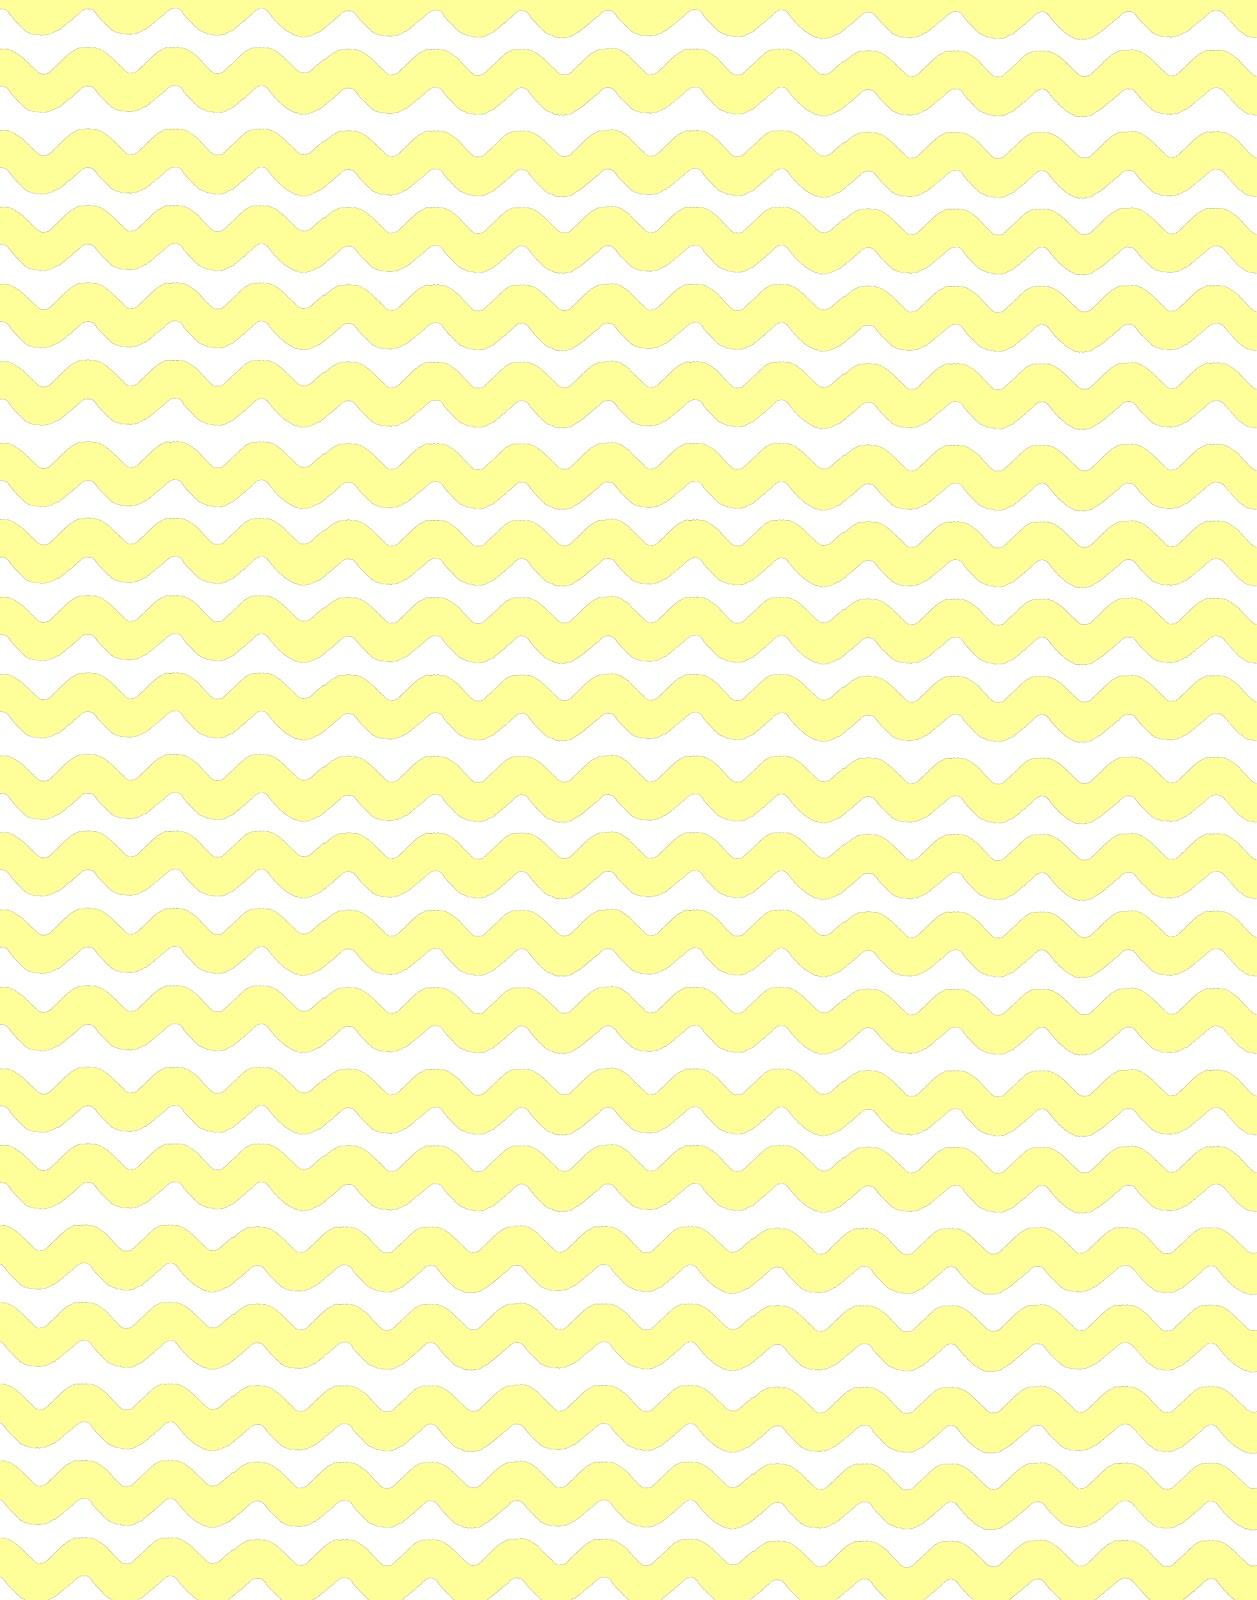 [44+] Yellow Pattern Wallpaper on WallpaperSafari